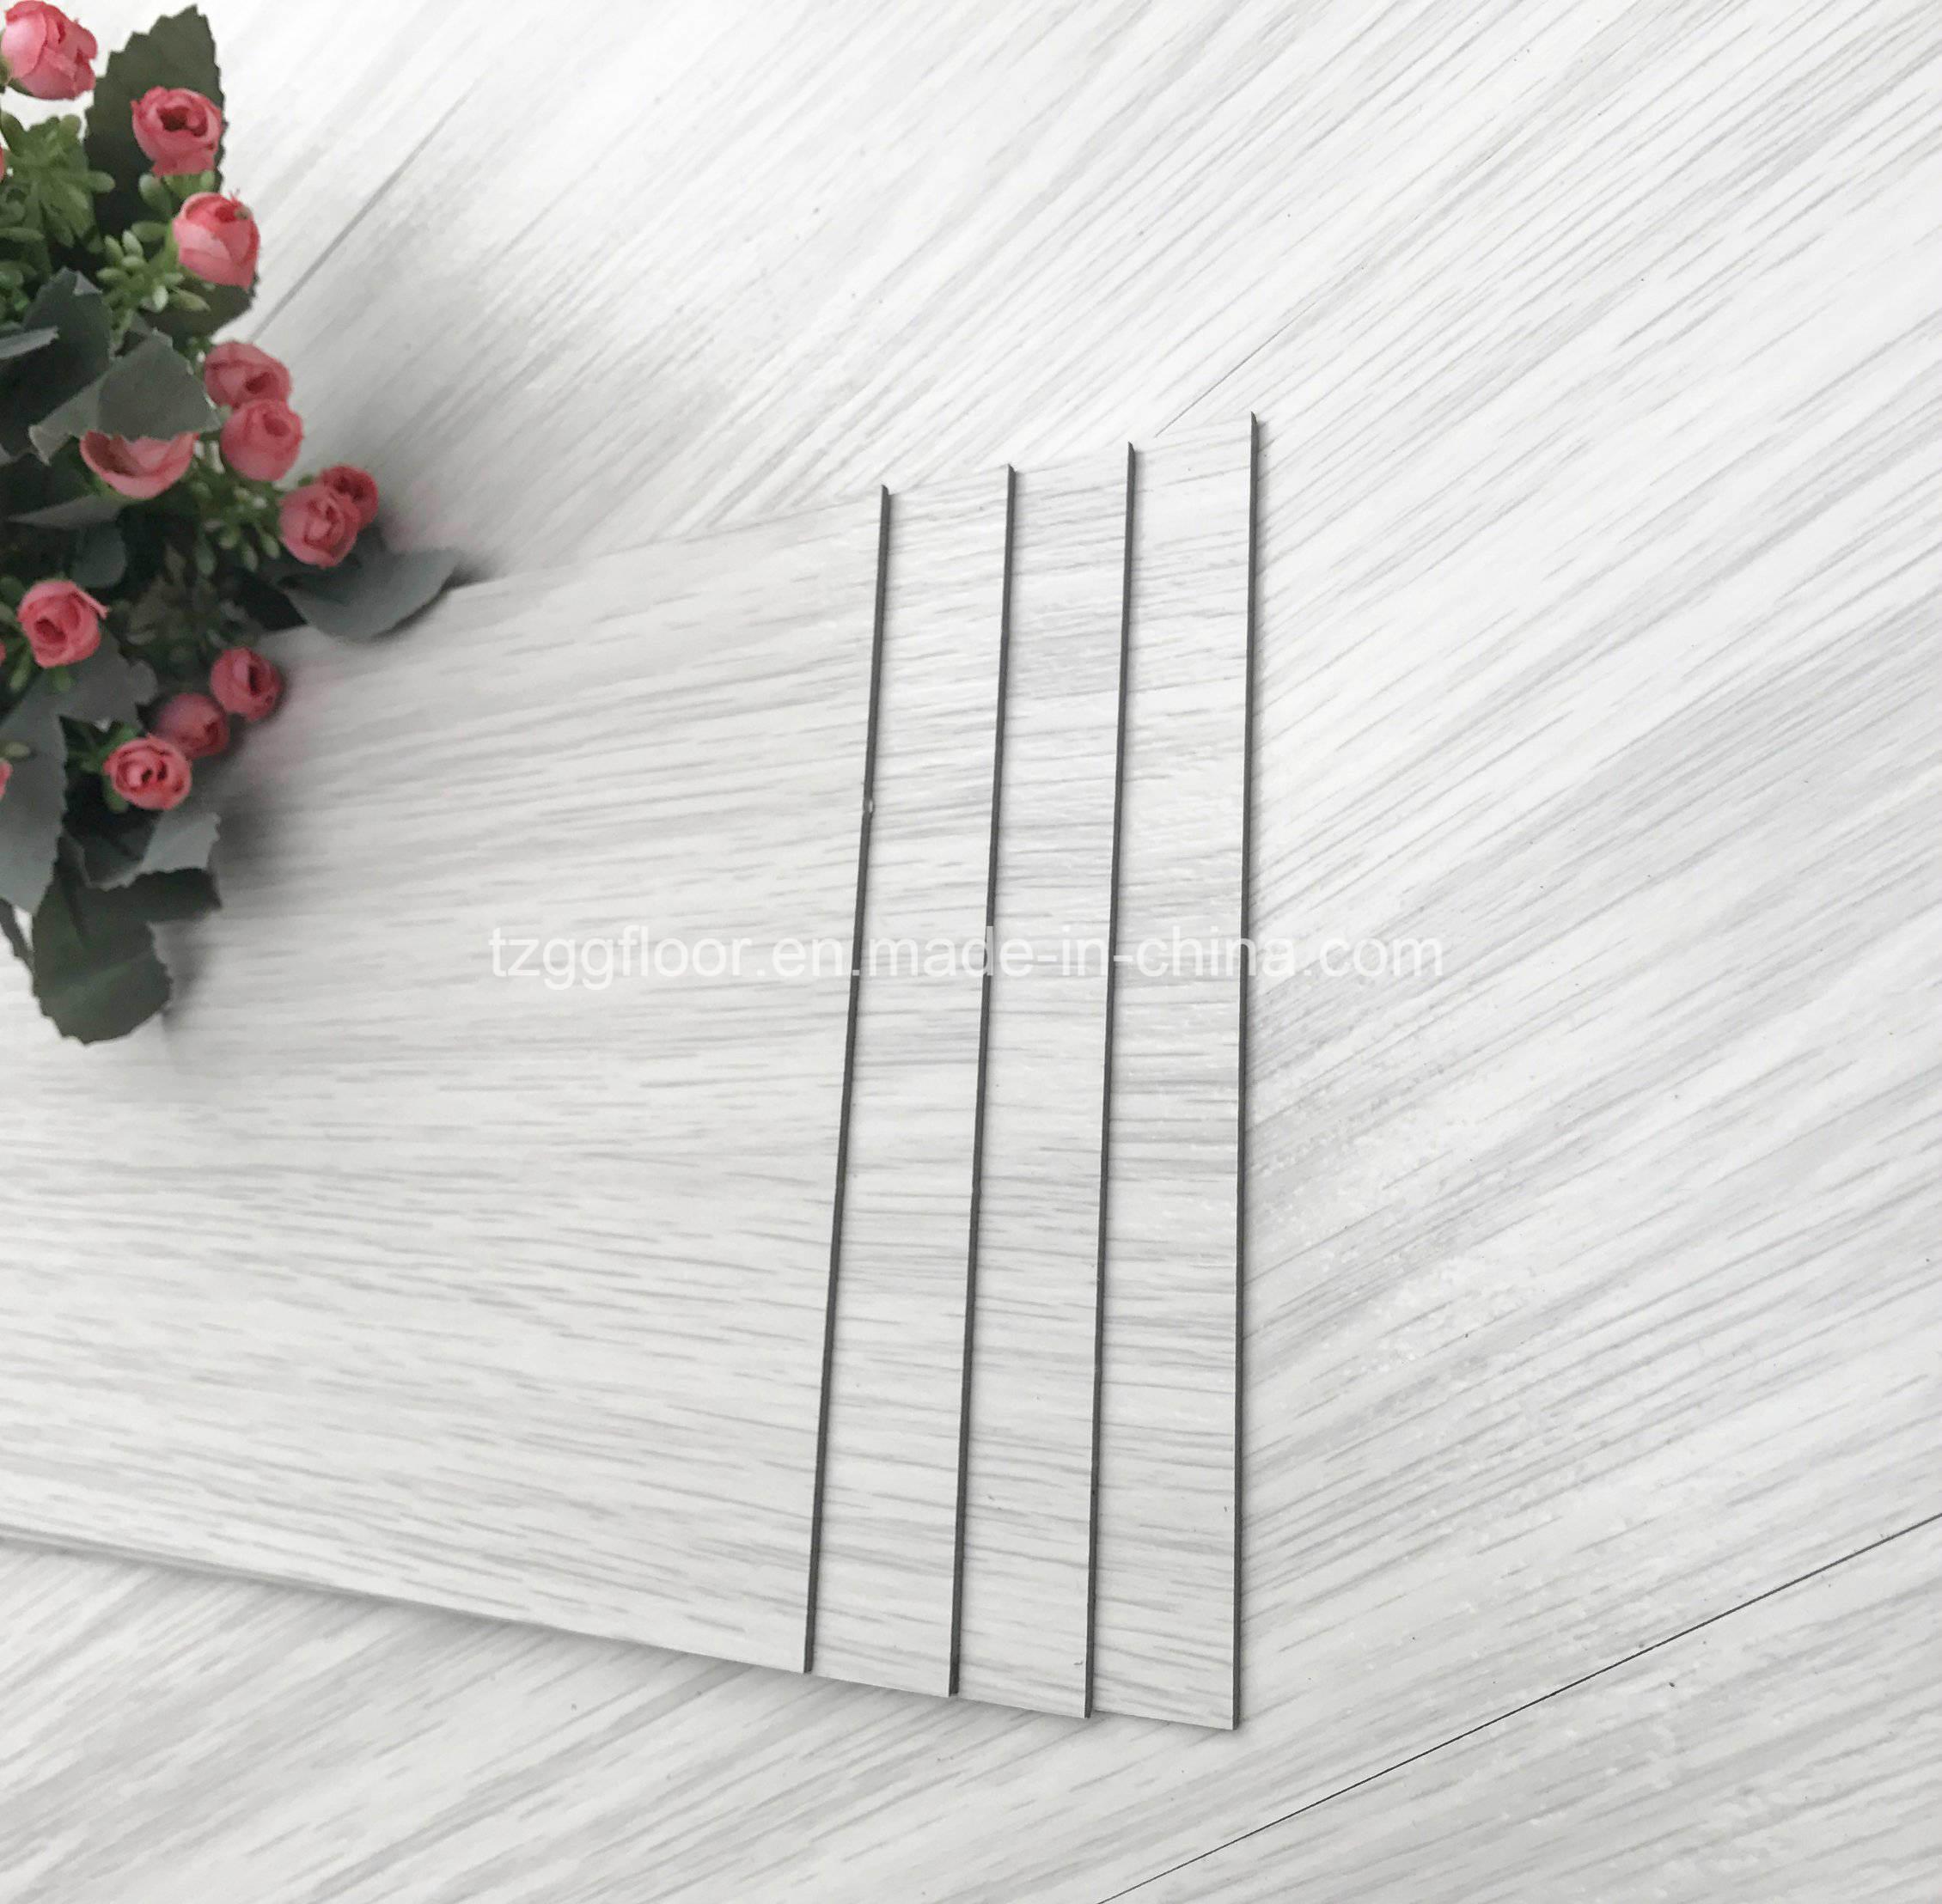 China Uv Coating Non Slip Plastic Floor Pvc Laminated Flooring Tiles Vinyl Plank